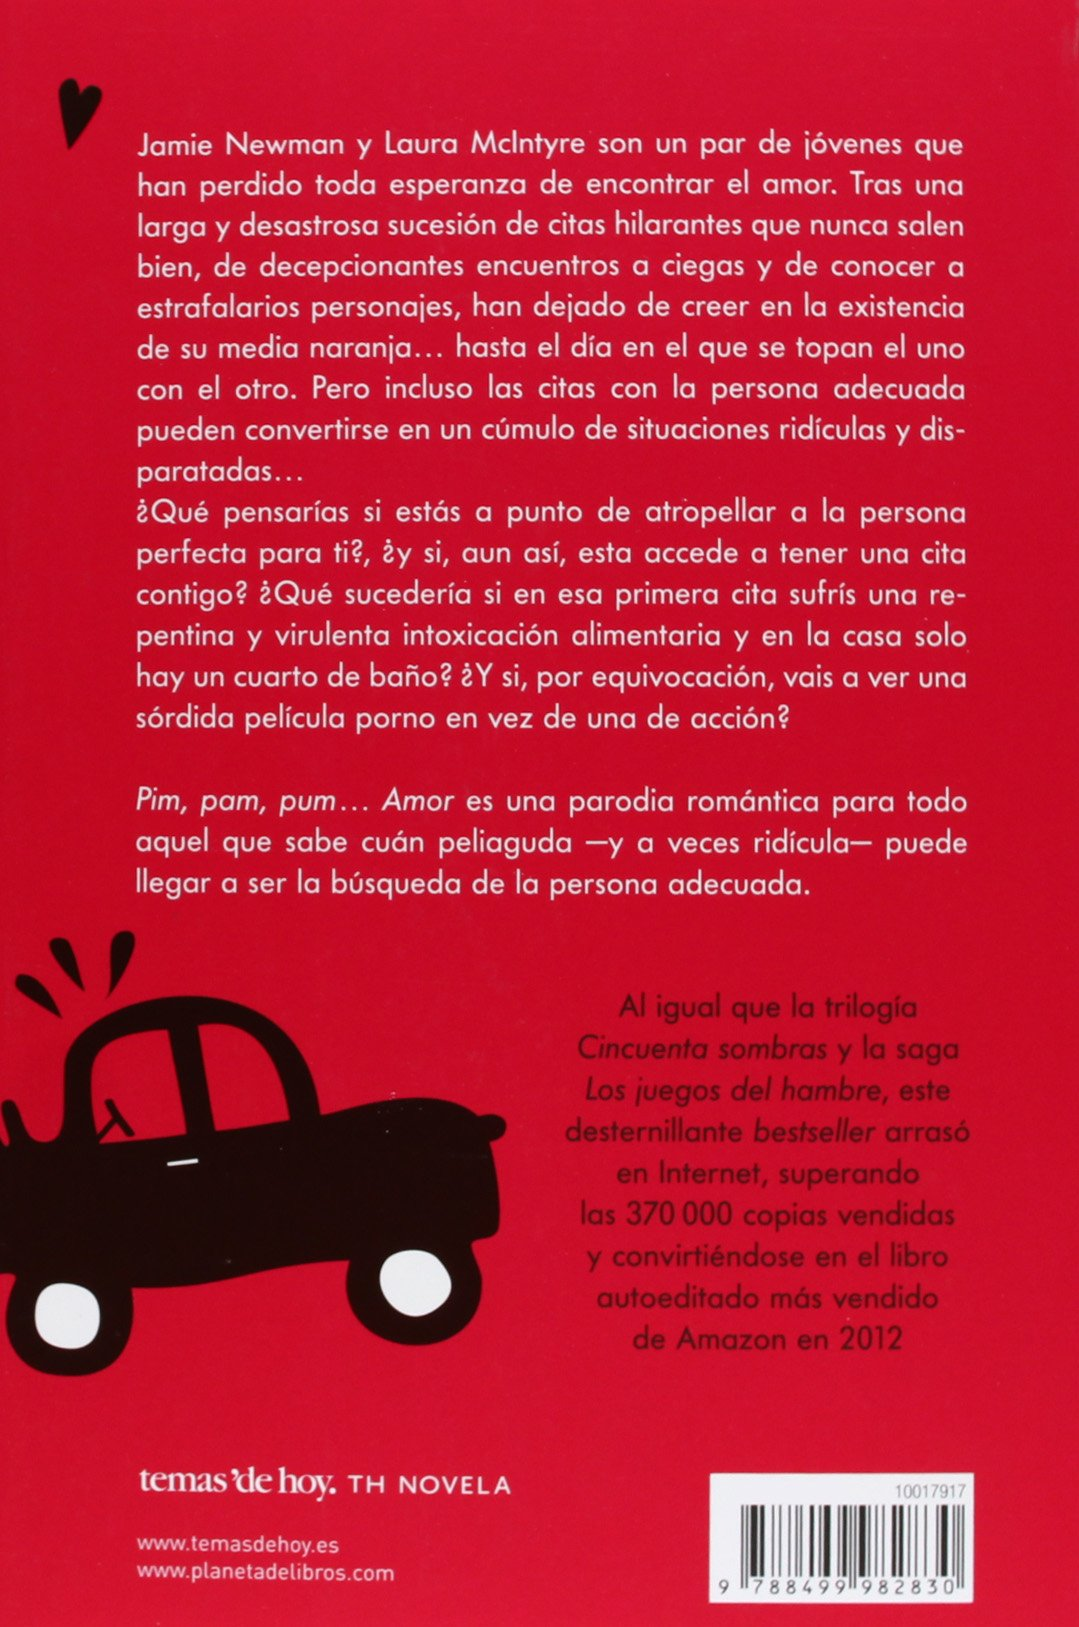 Pim, pam, pum... Amor (Spanish Edition)